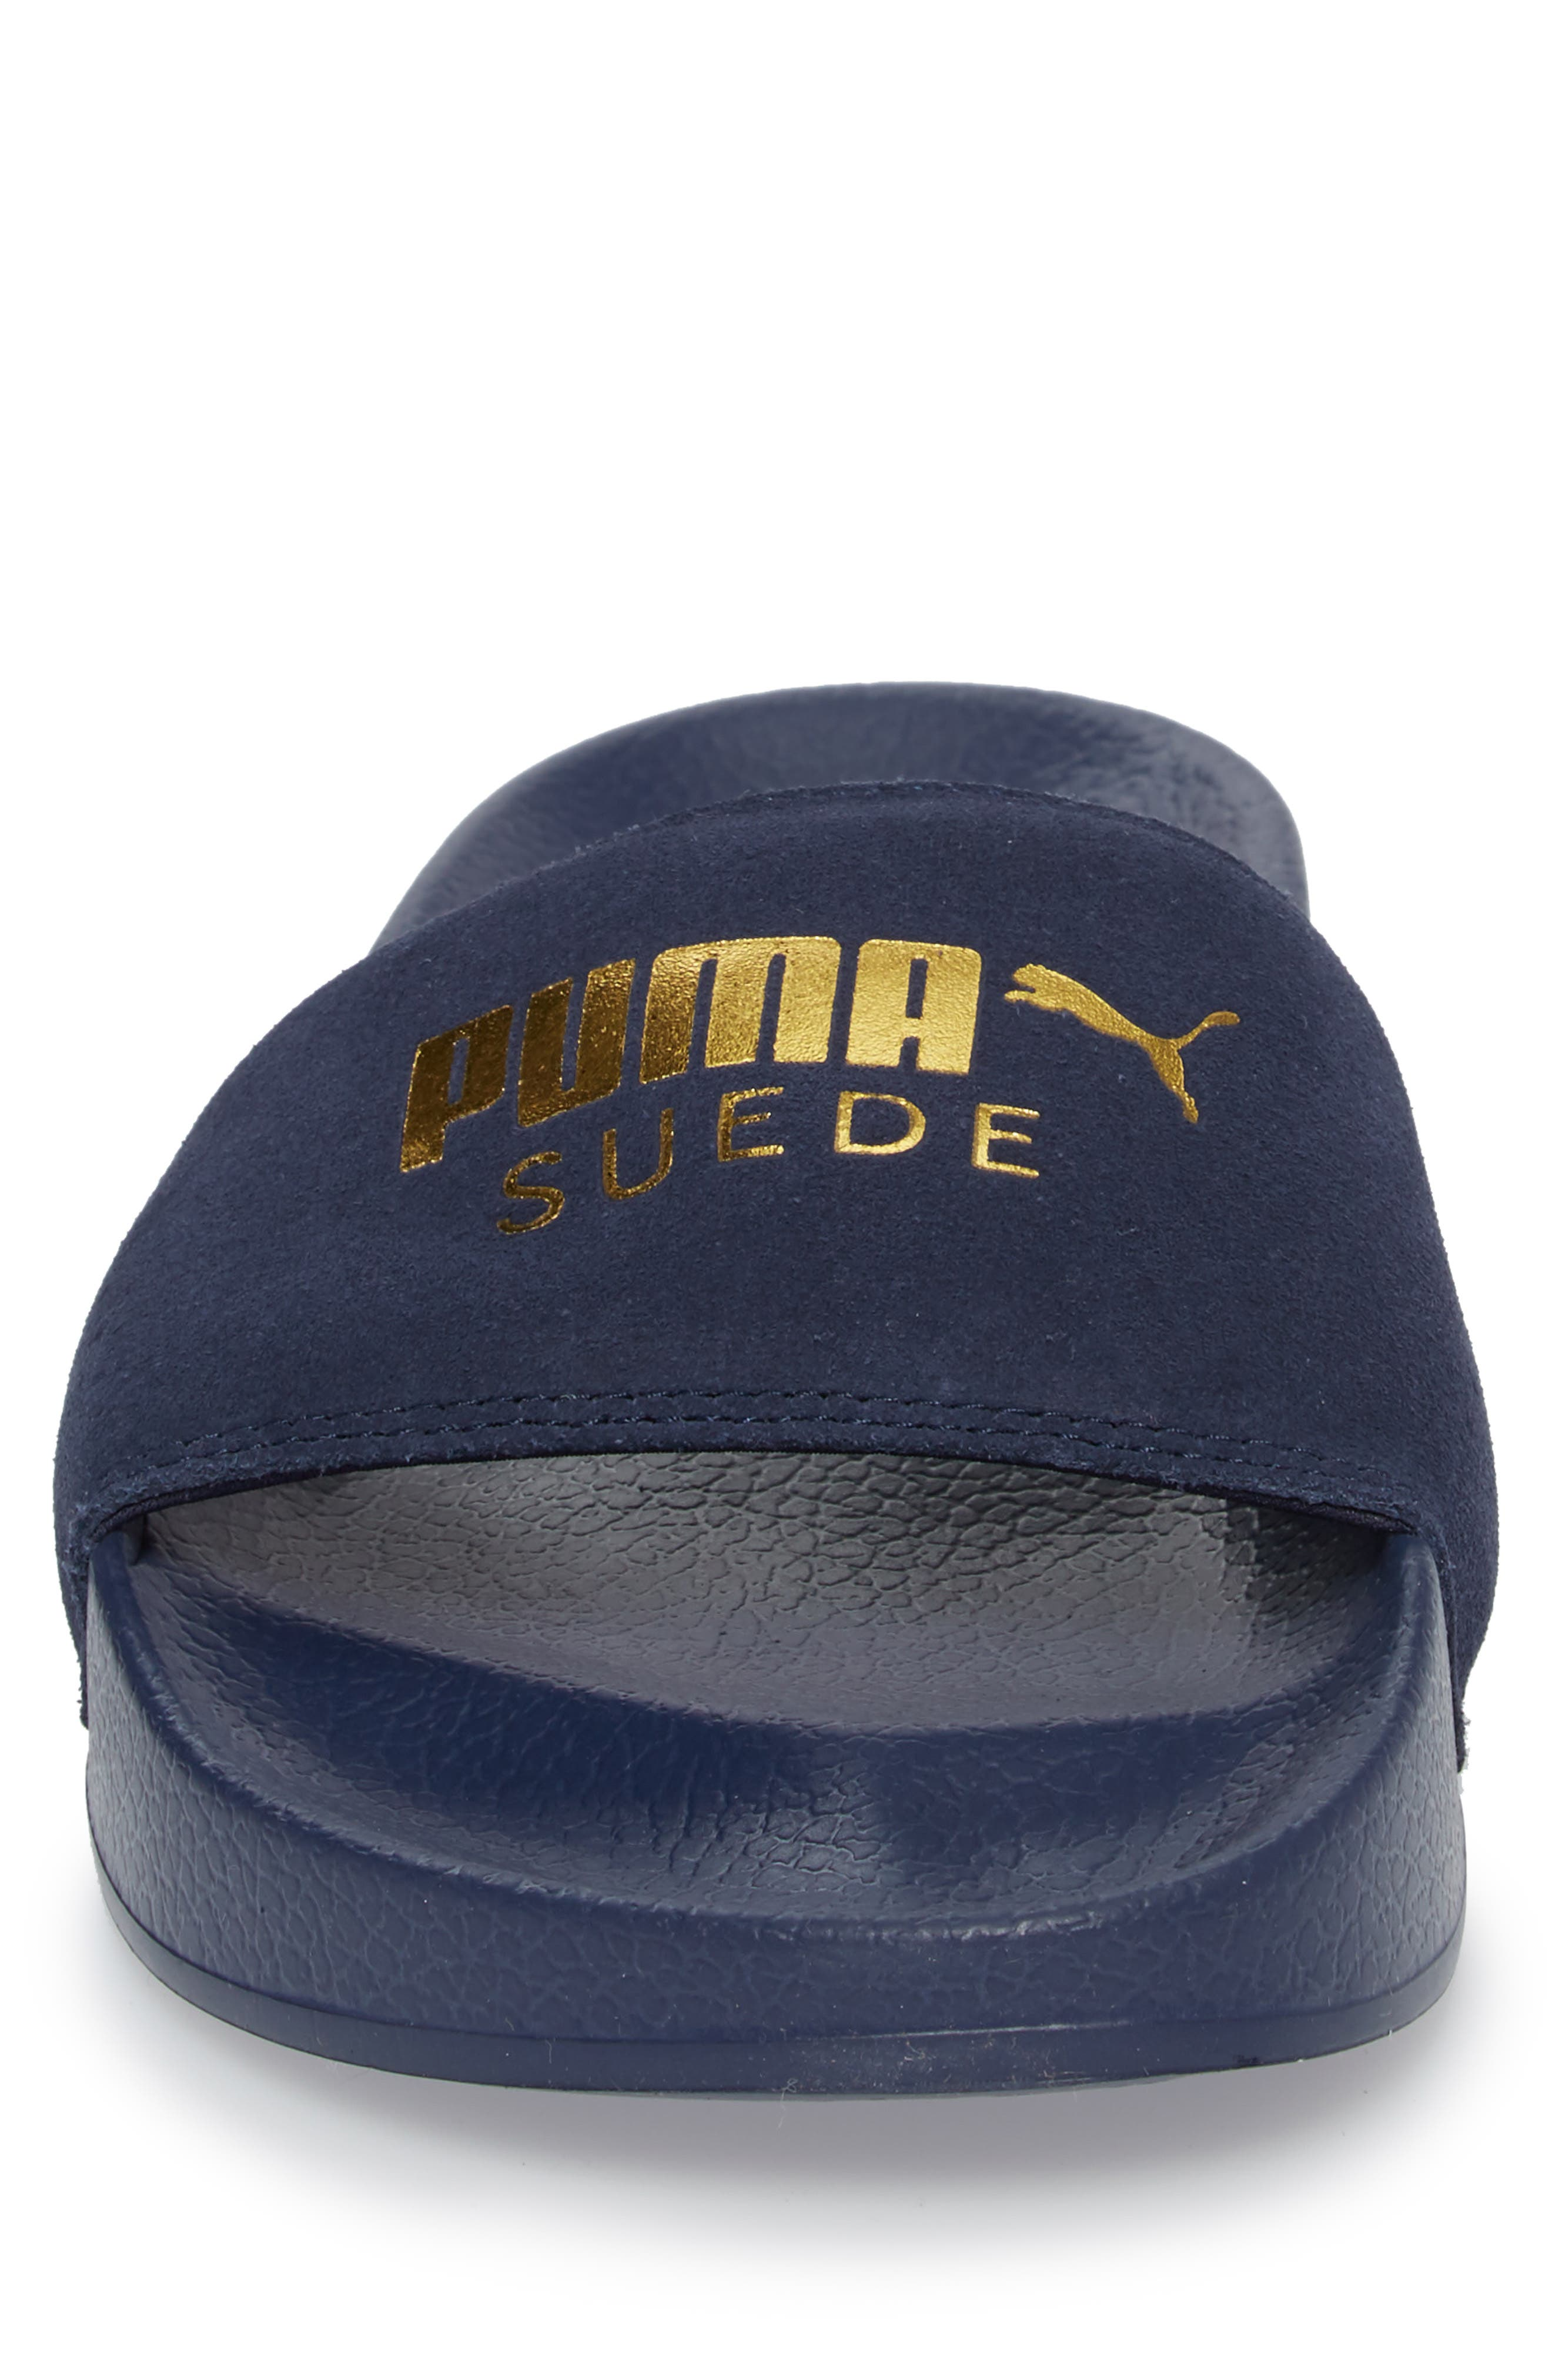 Leadcat Suede Slide Sandal,                             Alternate thumbnail 4, color,                             Peacoat/ Gold Leather/ Suede